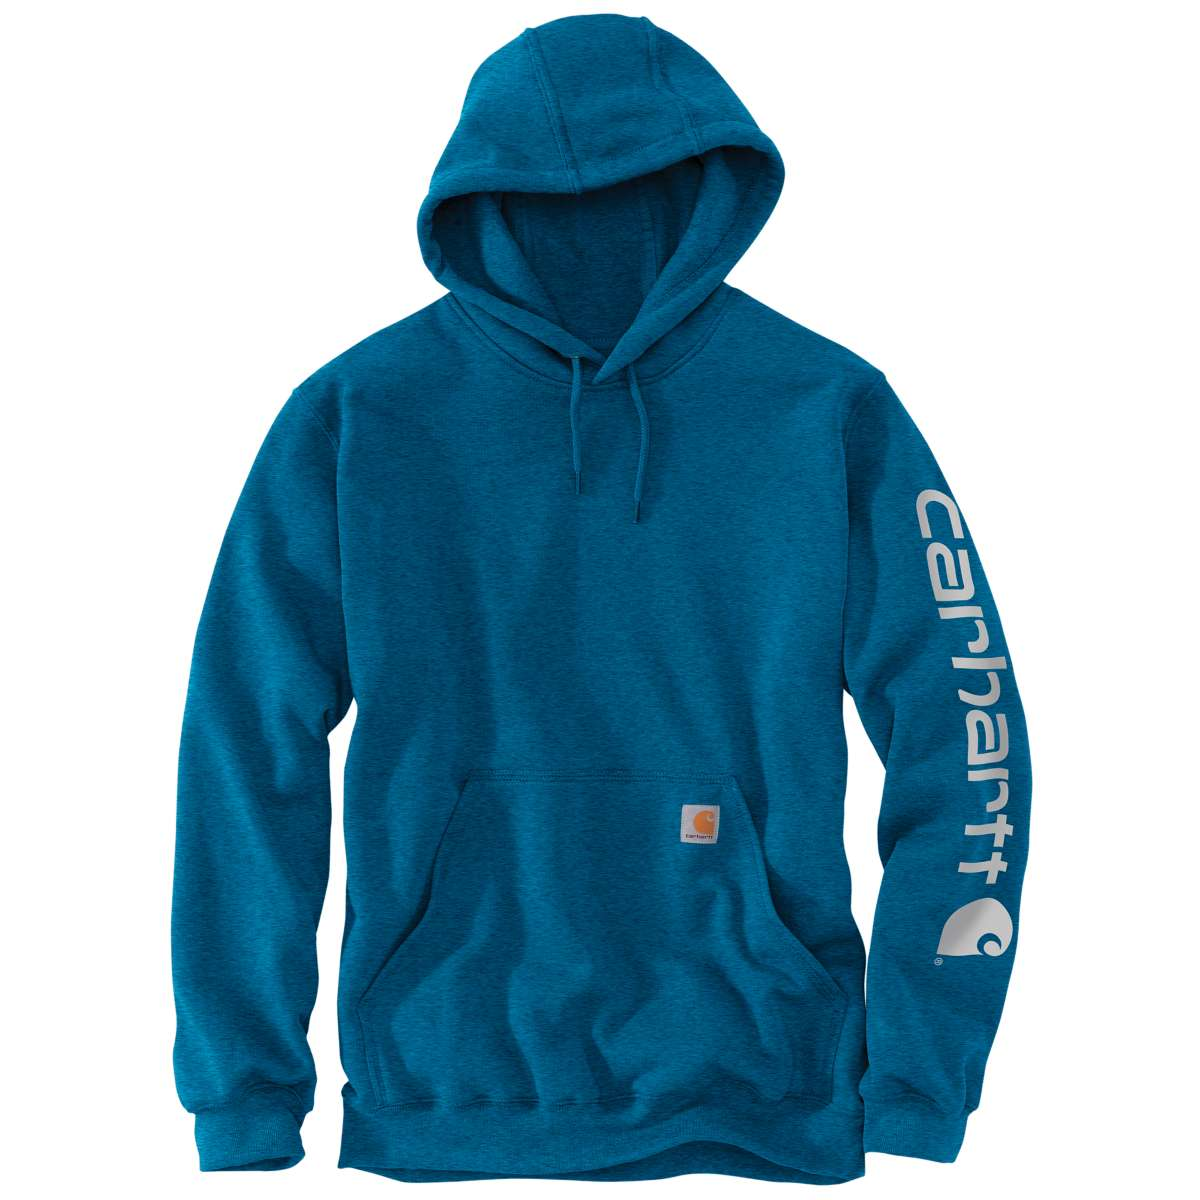 Carhartt Men's Midweight Hooded Logo Sweatshirt - Blue, S